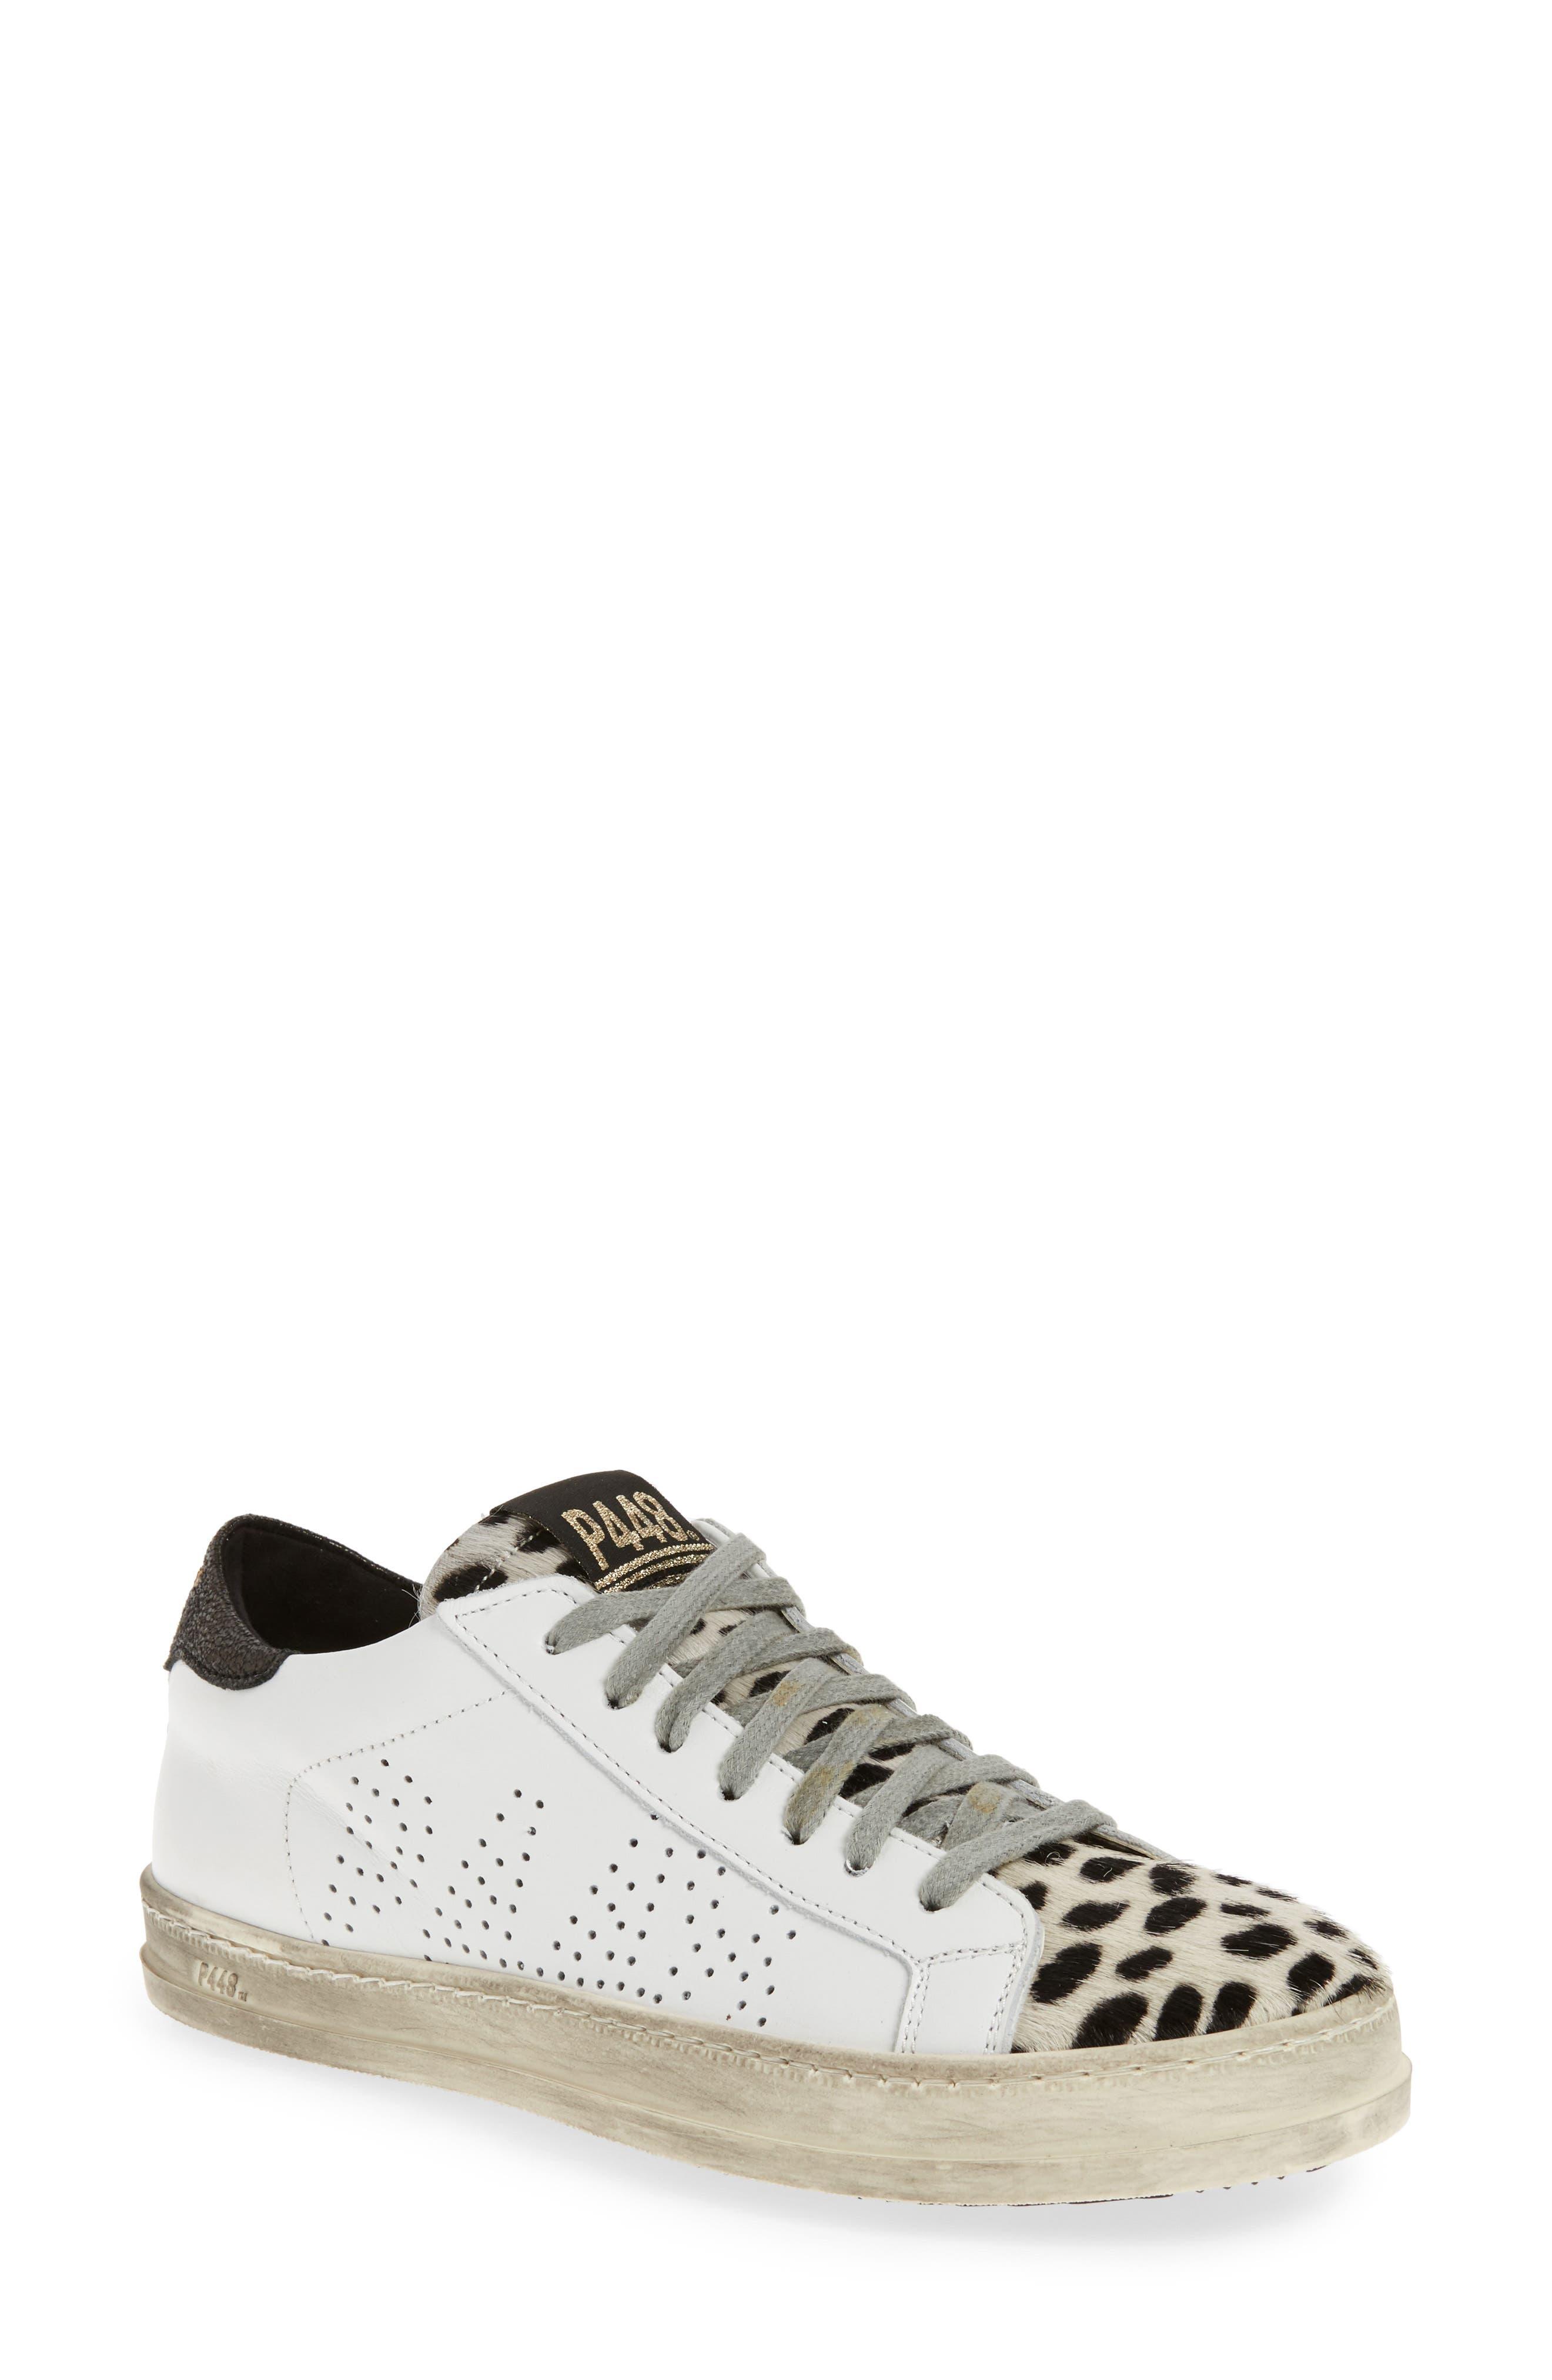 John Sneaker,                         Main,                         color, WHITE LEATHER/ CHEETAH